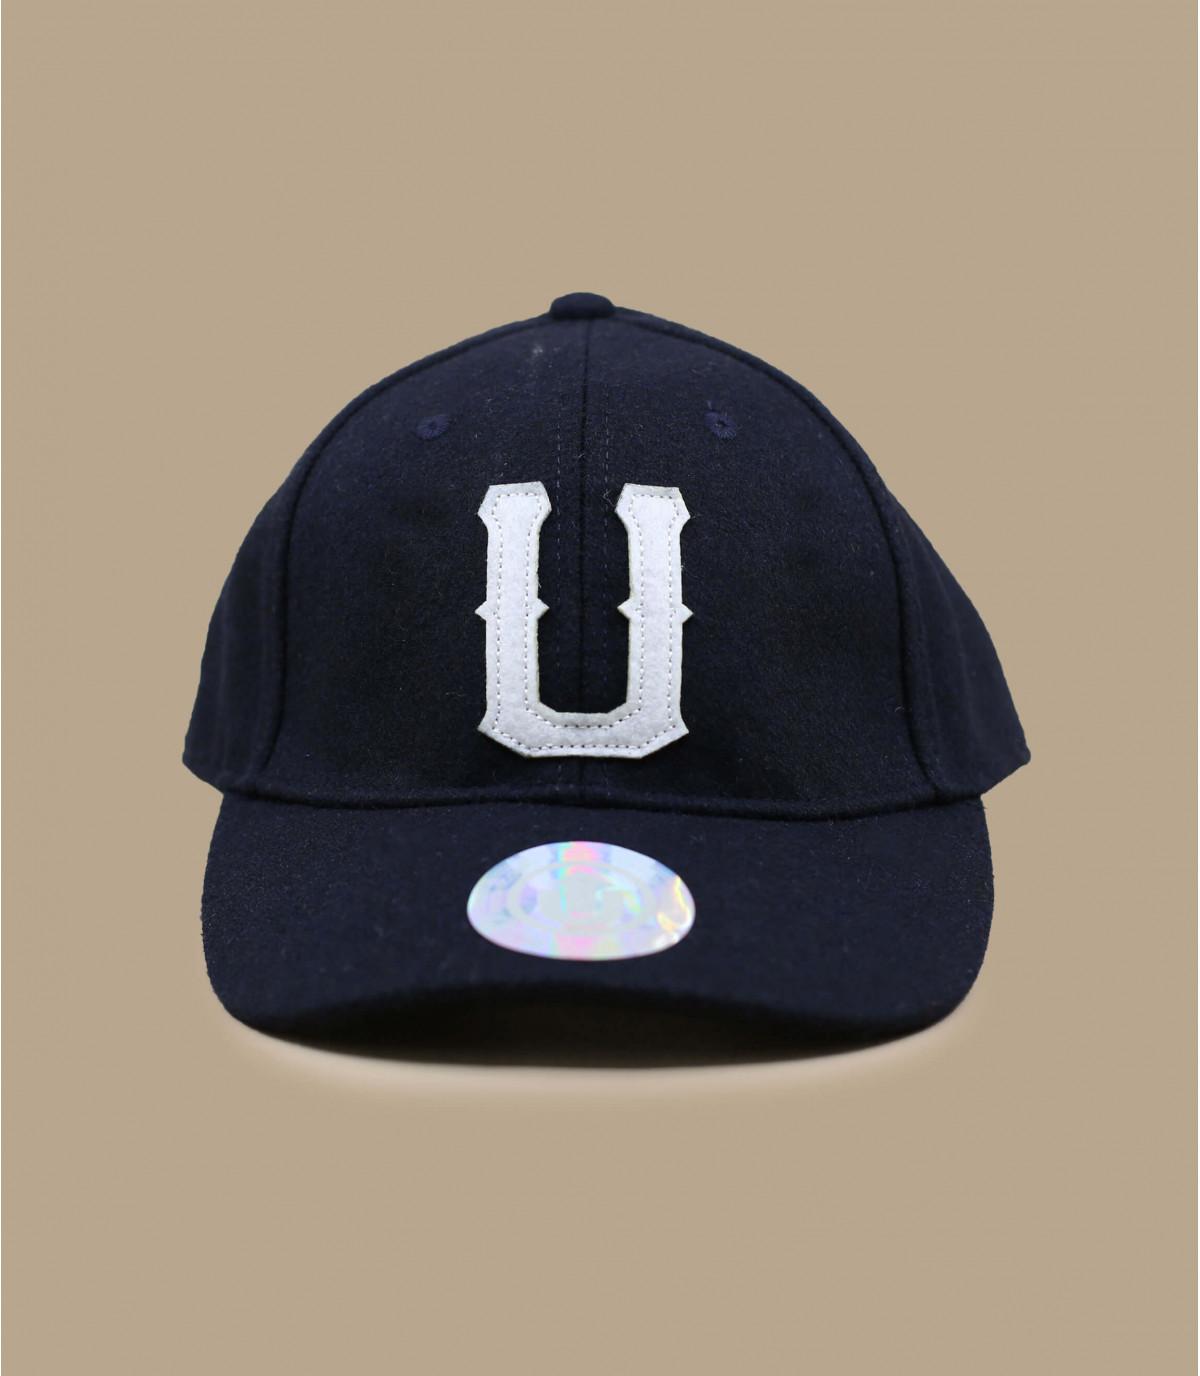 0769e91fcd435 Navy trucker cap - United baseball cap dark navy by Upfront.